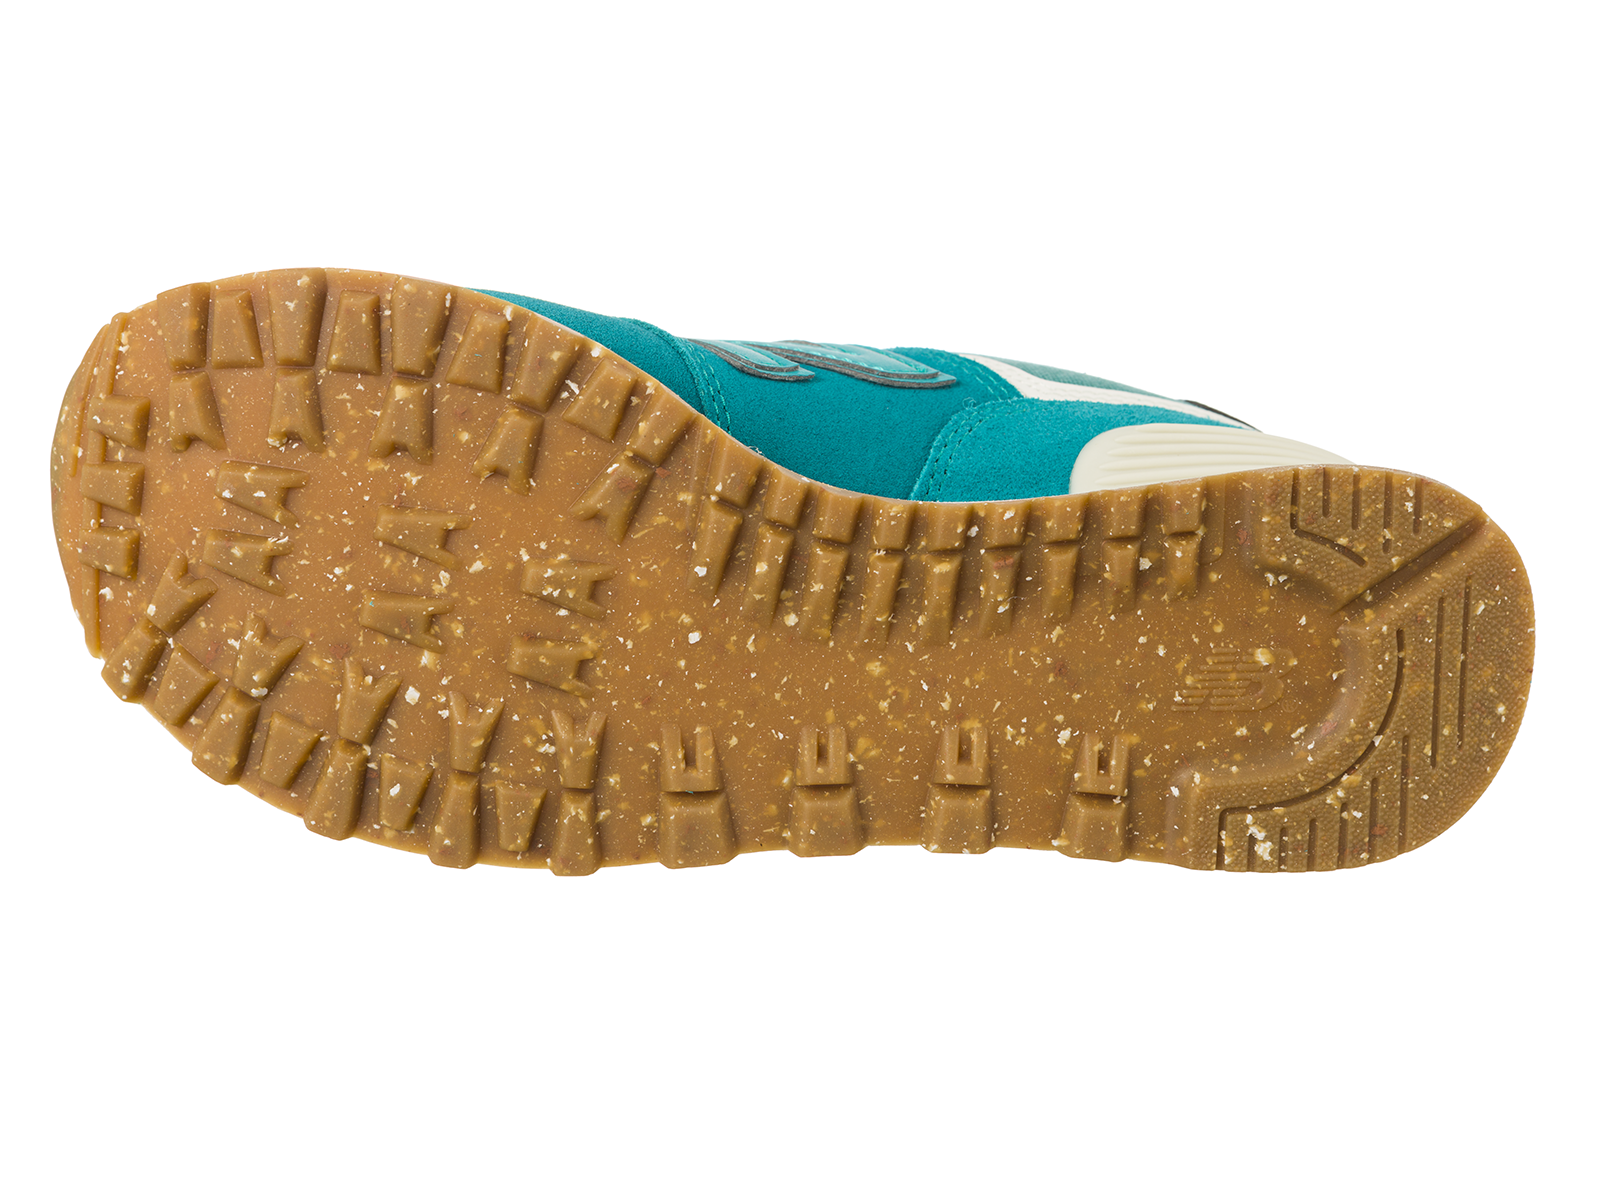 new balance wl574 femmes chaussures de sport baskets. Black Bedroom Furniture Sets. Home Design Ideas